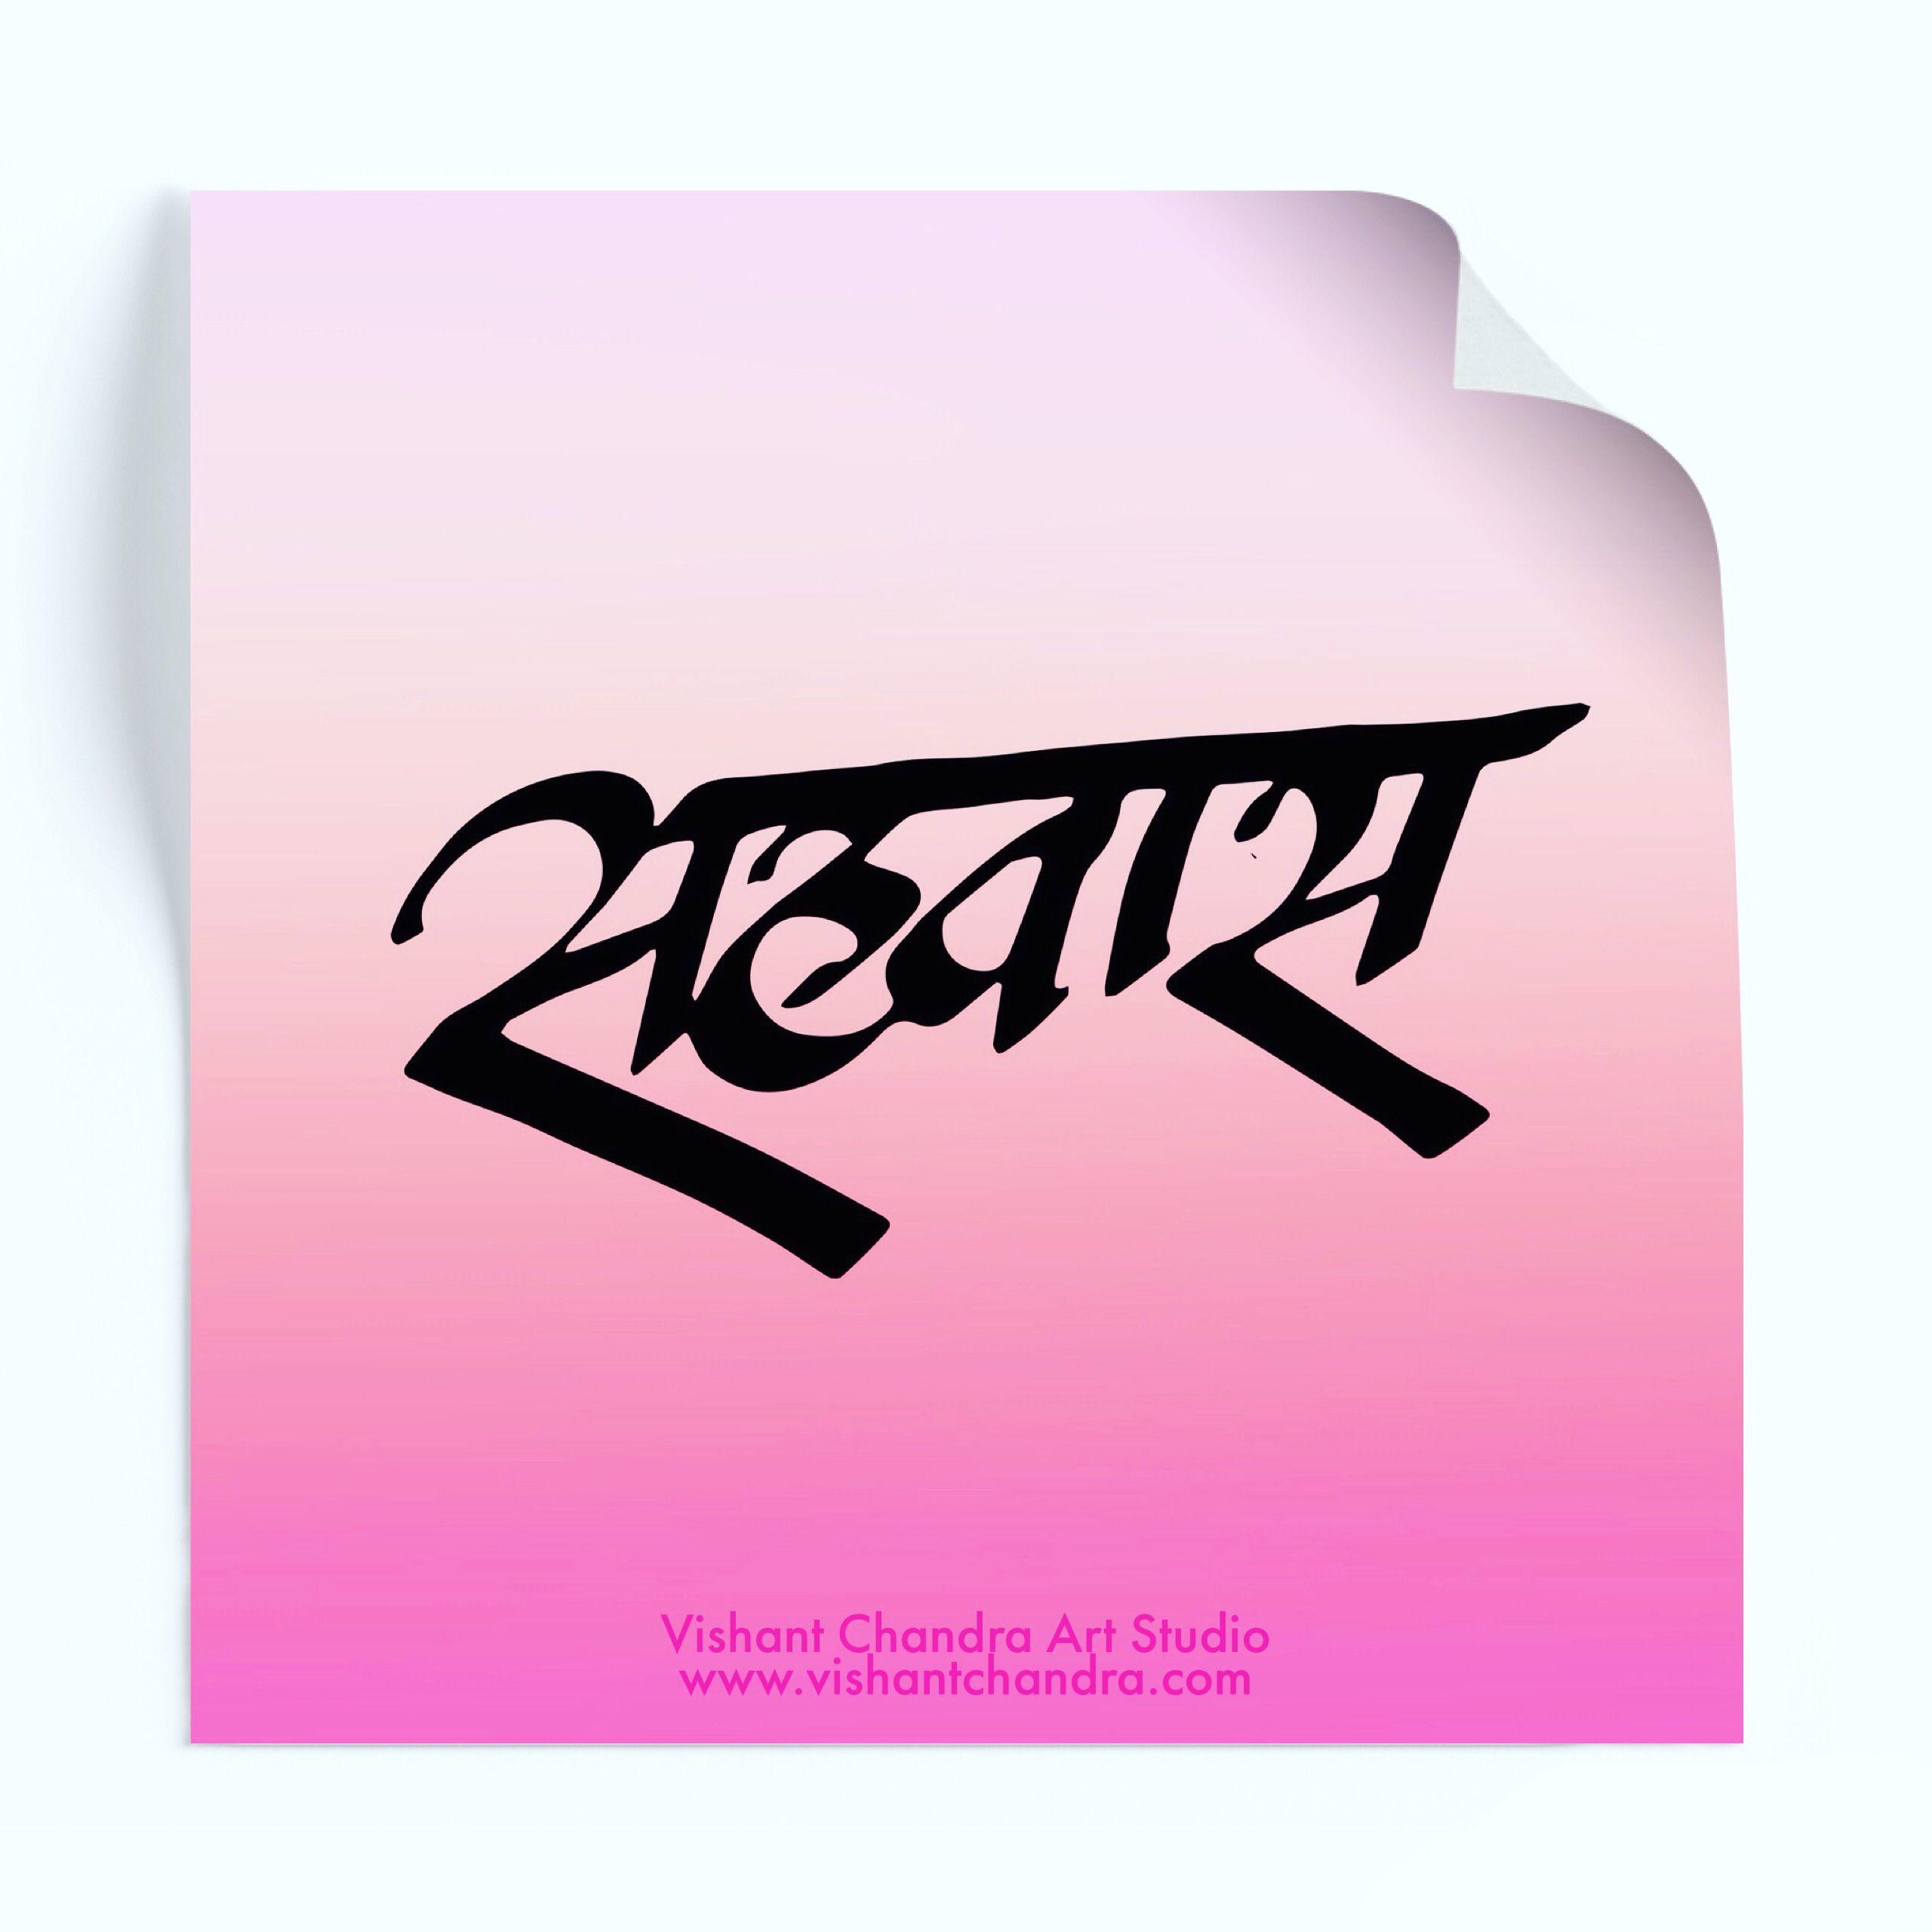 Calligraphic Expressions By VISHANT CHANDRA Devanagari Marathi Calligraphy Calligraphymasters Art